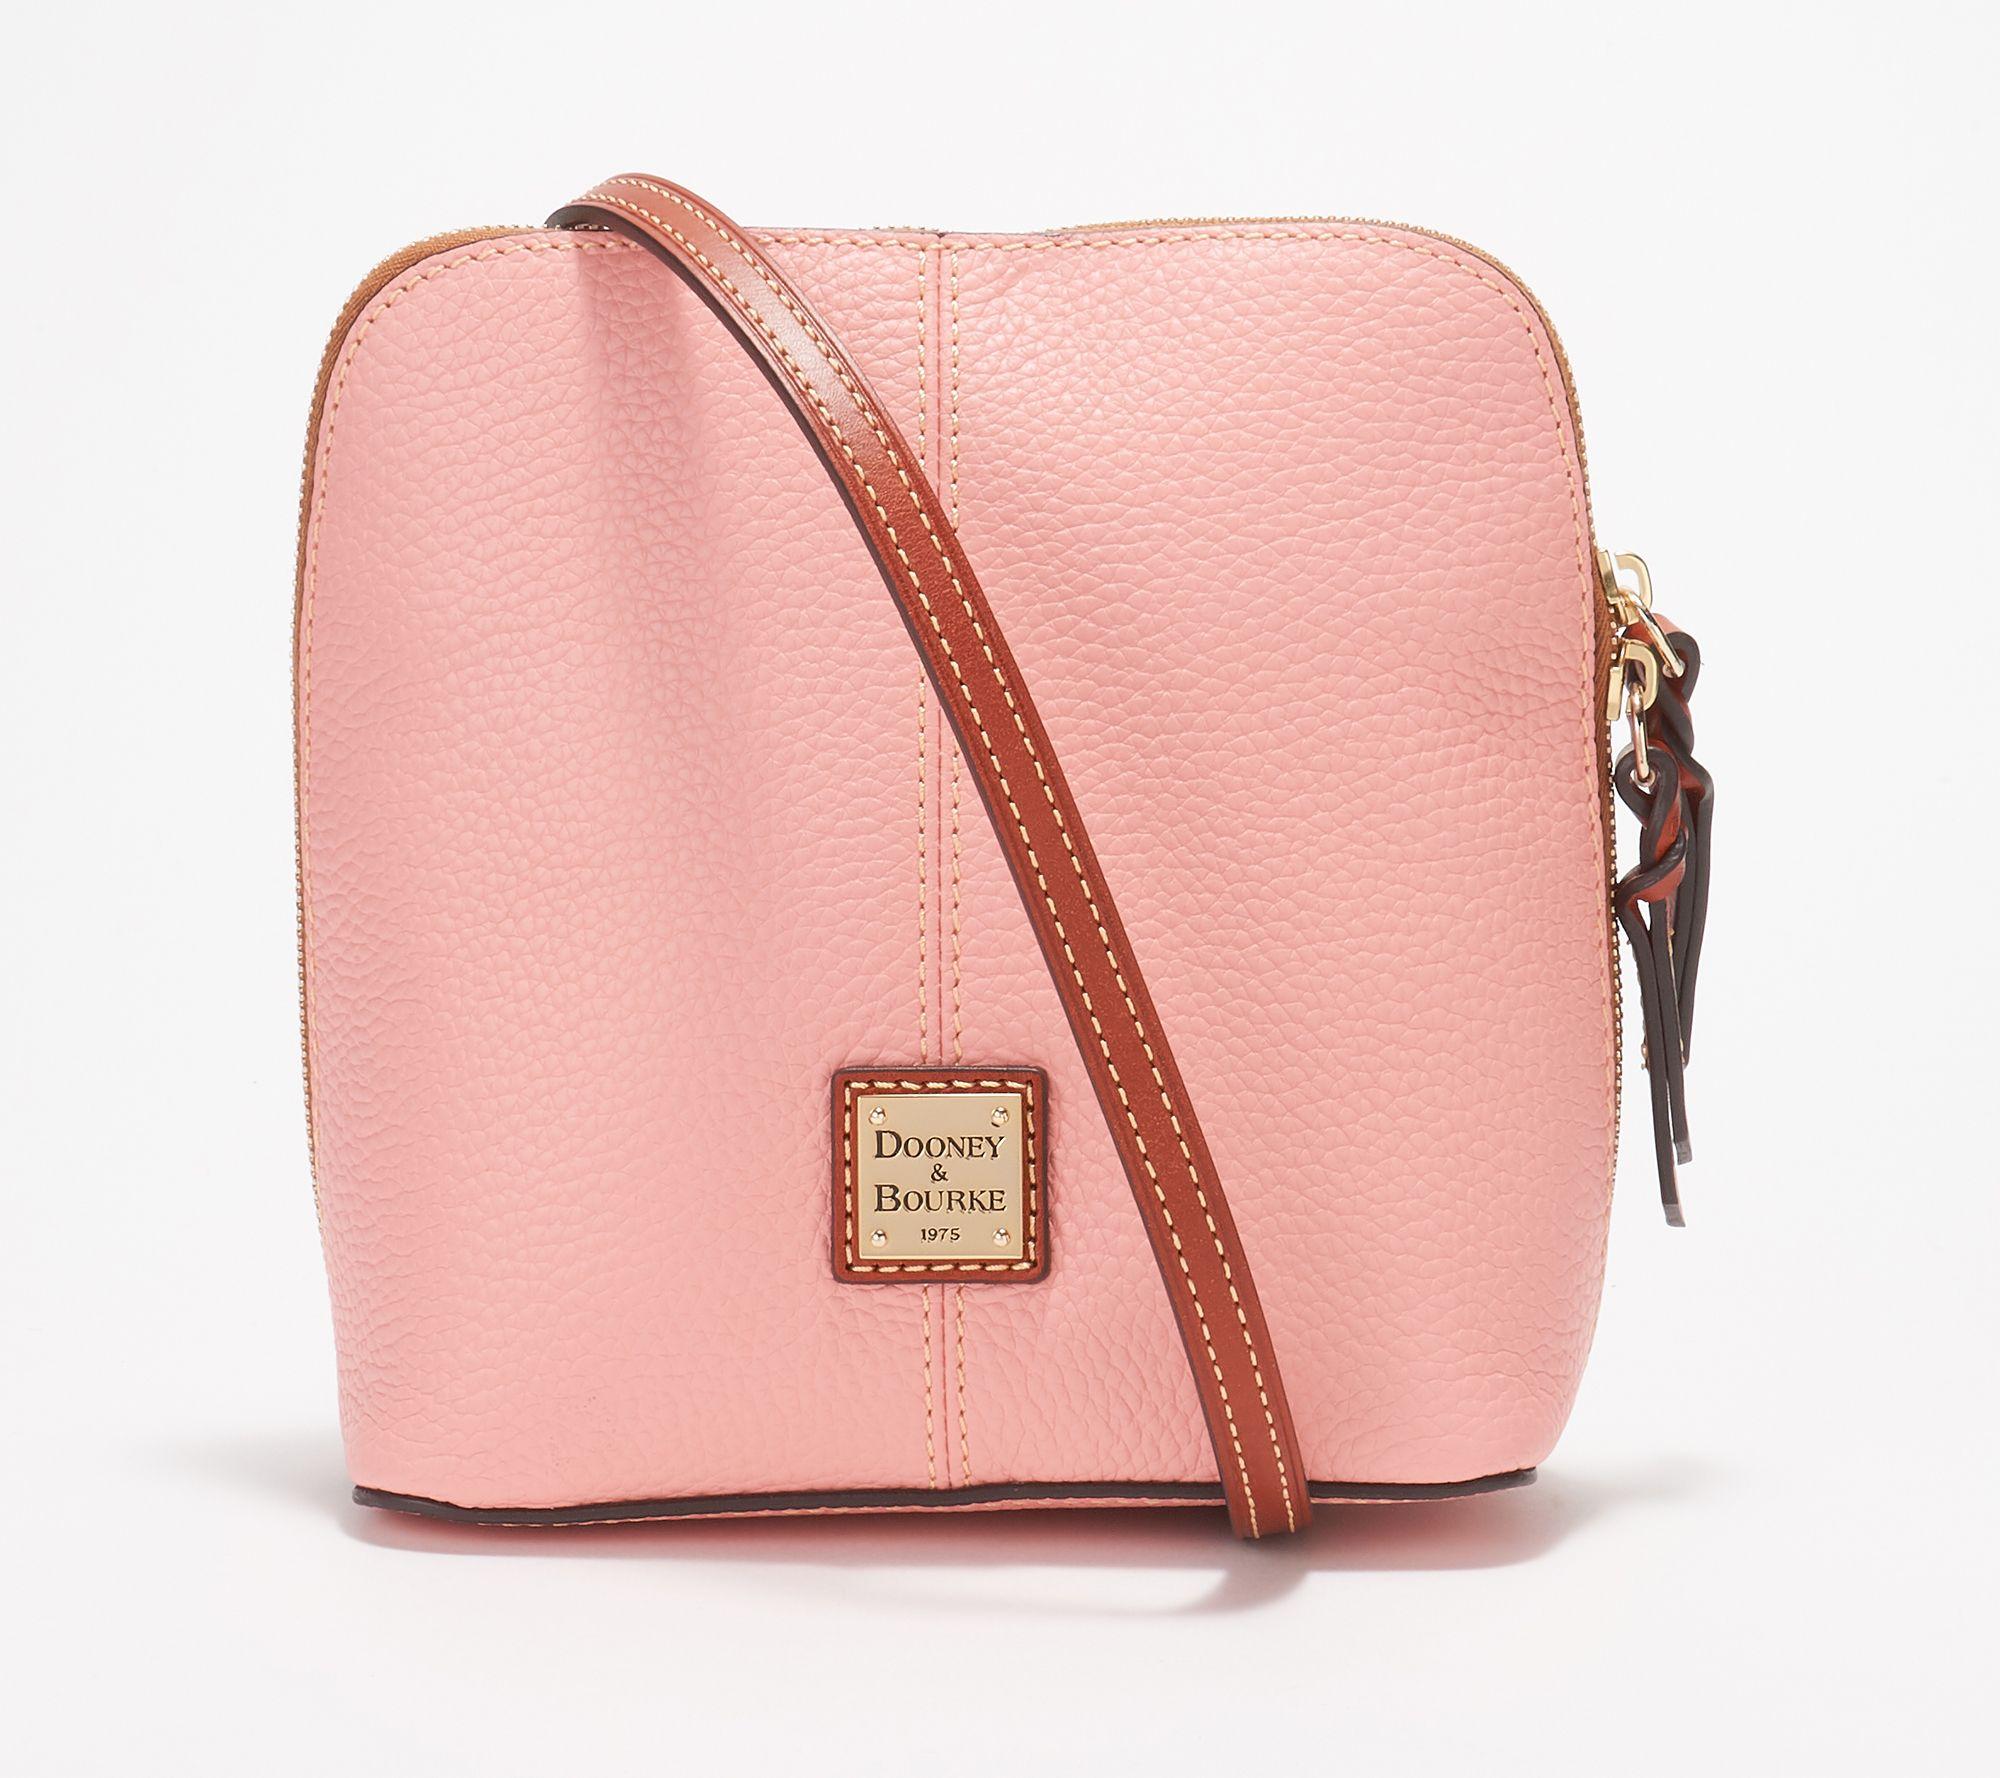 b187684d729bd Dooney   Bourke Pebble Leather Crossbody Handbag -Trixie - Page 1 — QVC.com